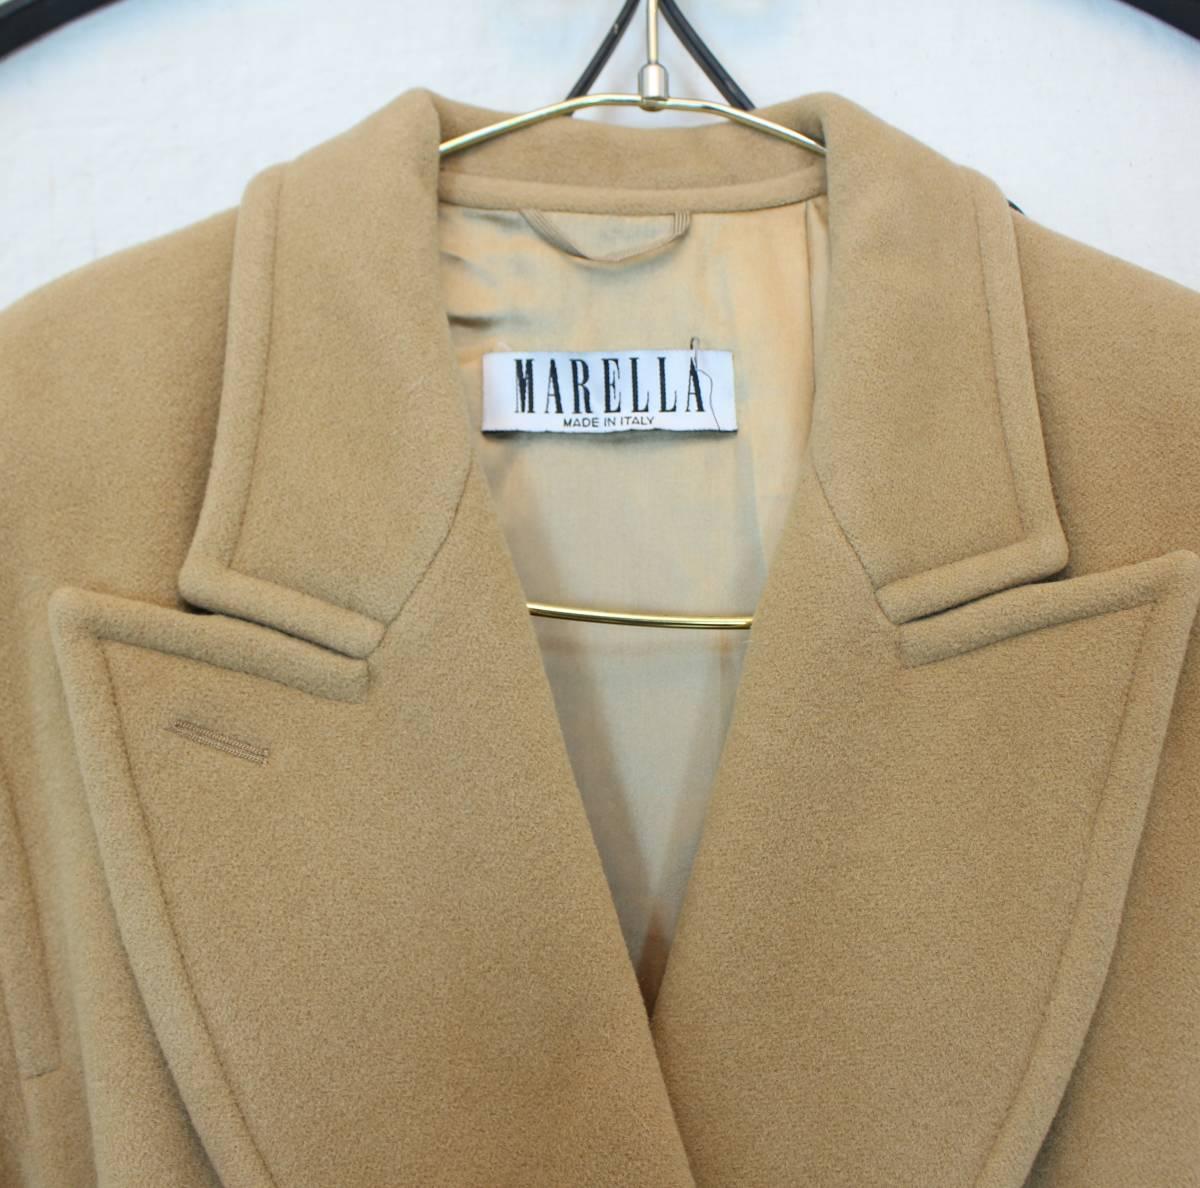 MARELLA ANGORA BREND WOOL BELTED COAT MADE IN ITALY/マレーラアンゴラ混ウールベルテッドコート_画像3